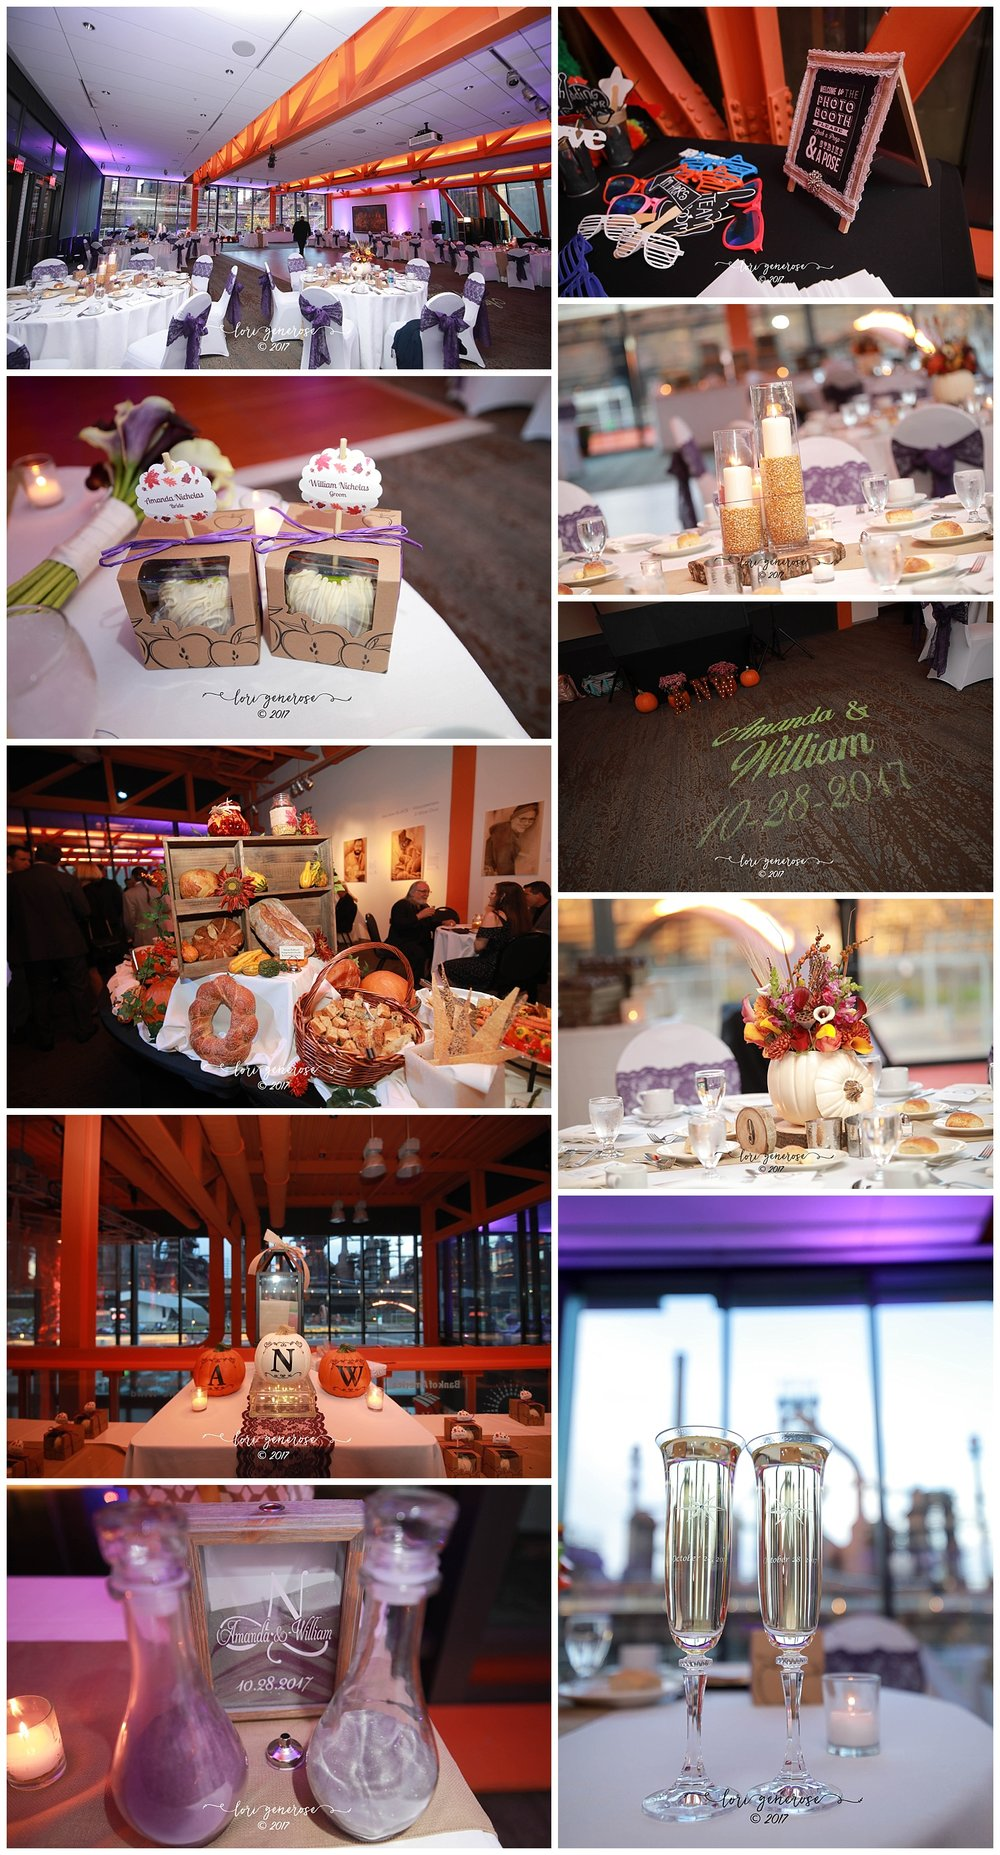 weddingreceptiondetaillsfavorscenterpiesfallweddingatsteelstacksbethlehempaweddingvenue.jpg